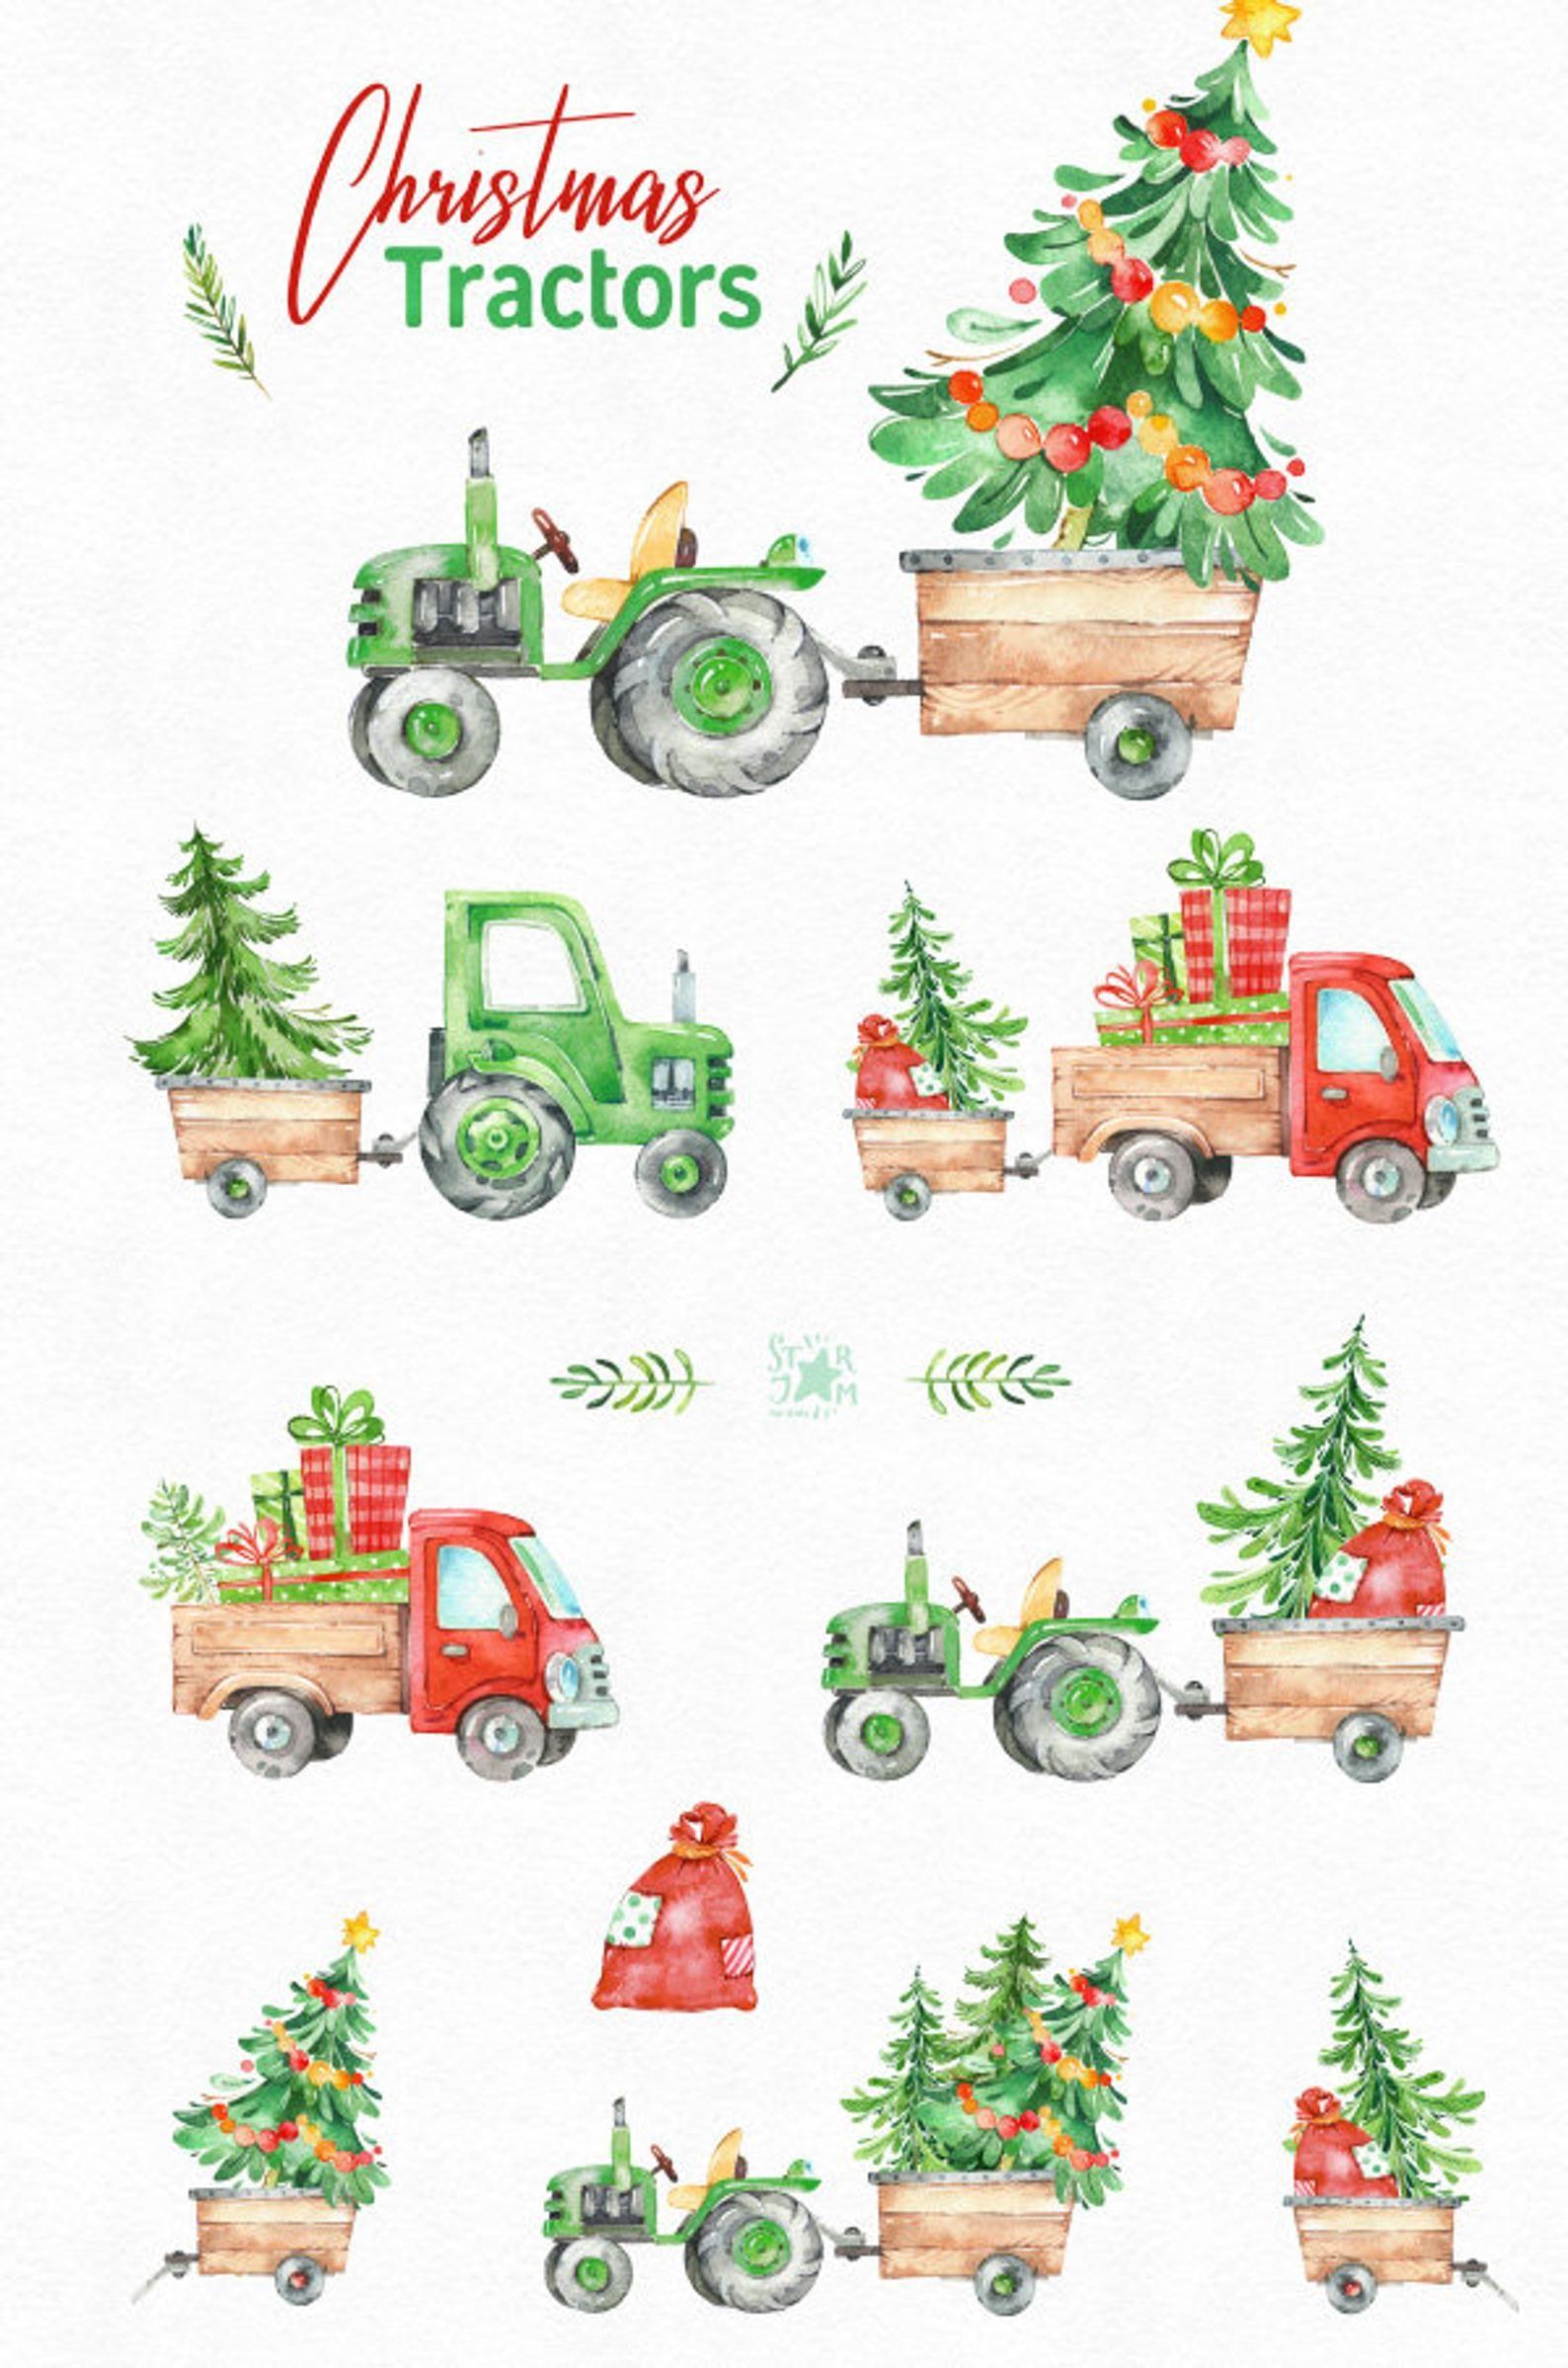 Christmas Tractors Green Watercolor Holiday Country Clipart Etsy Christmas Watercolor Christmas Illustration Christmas Art